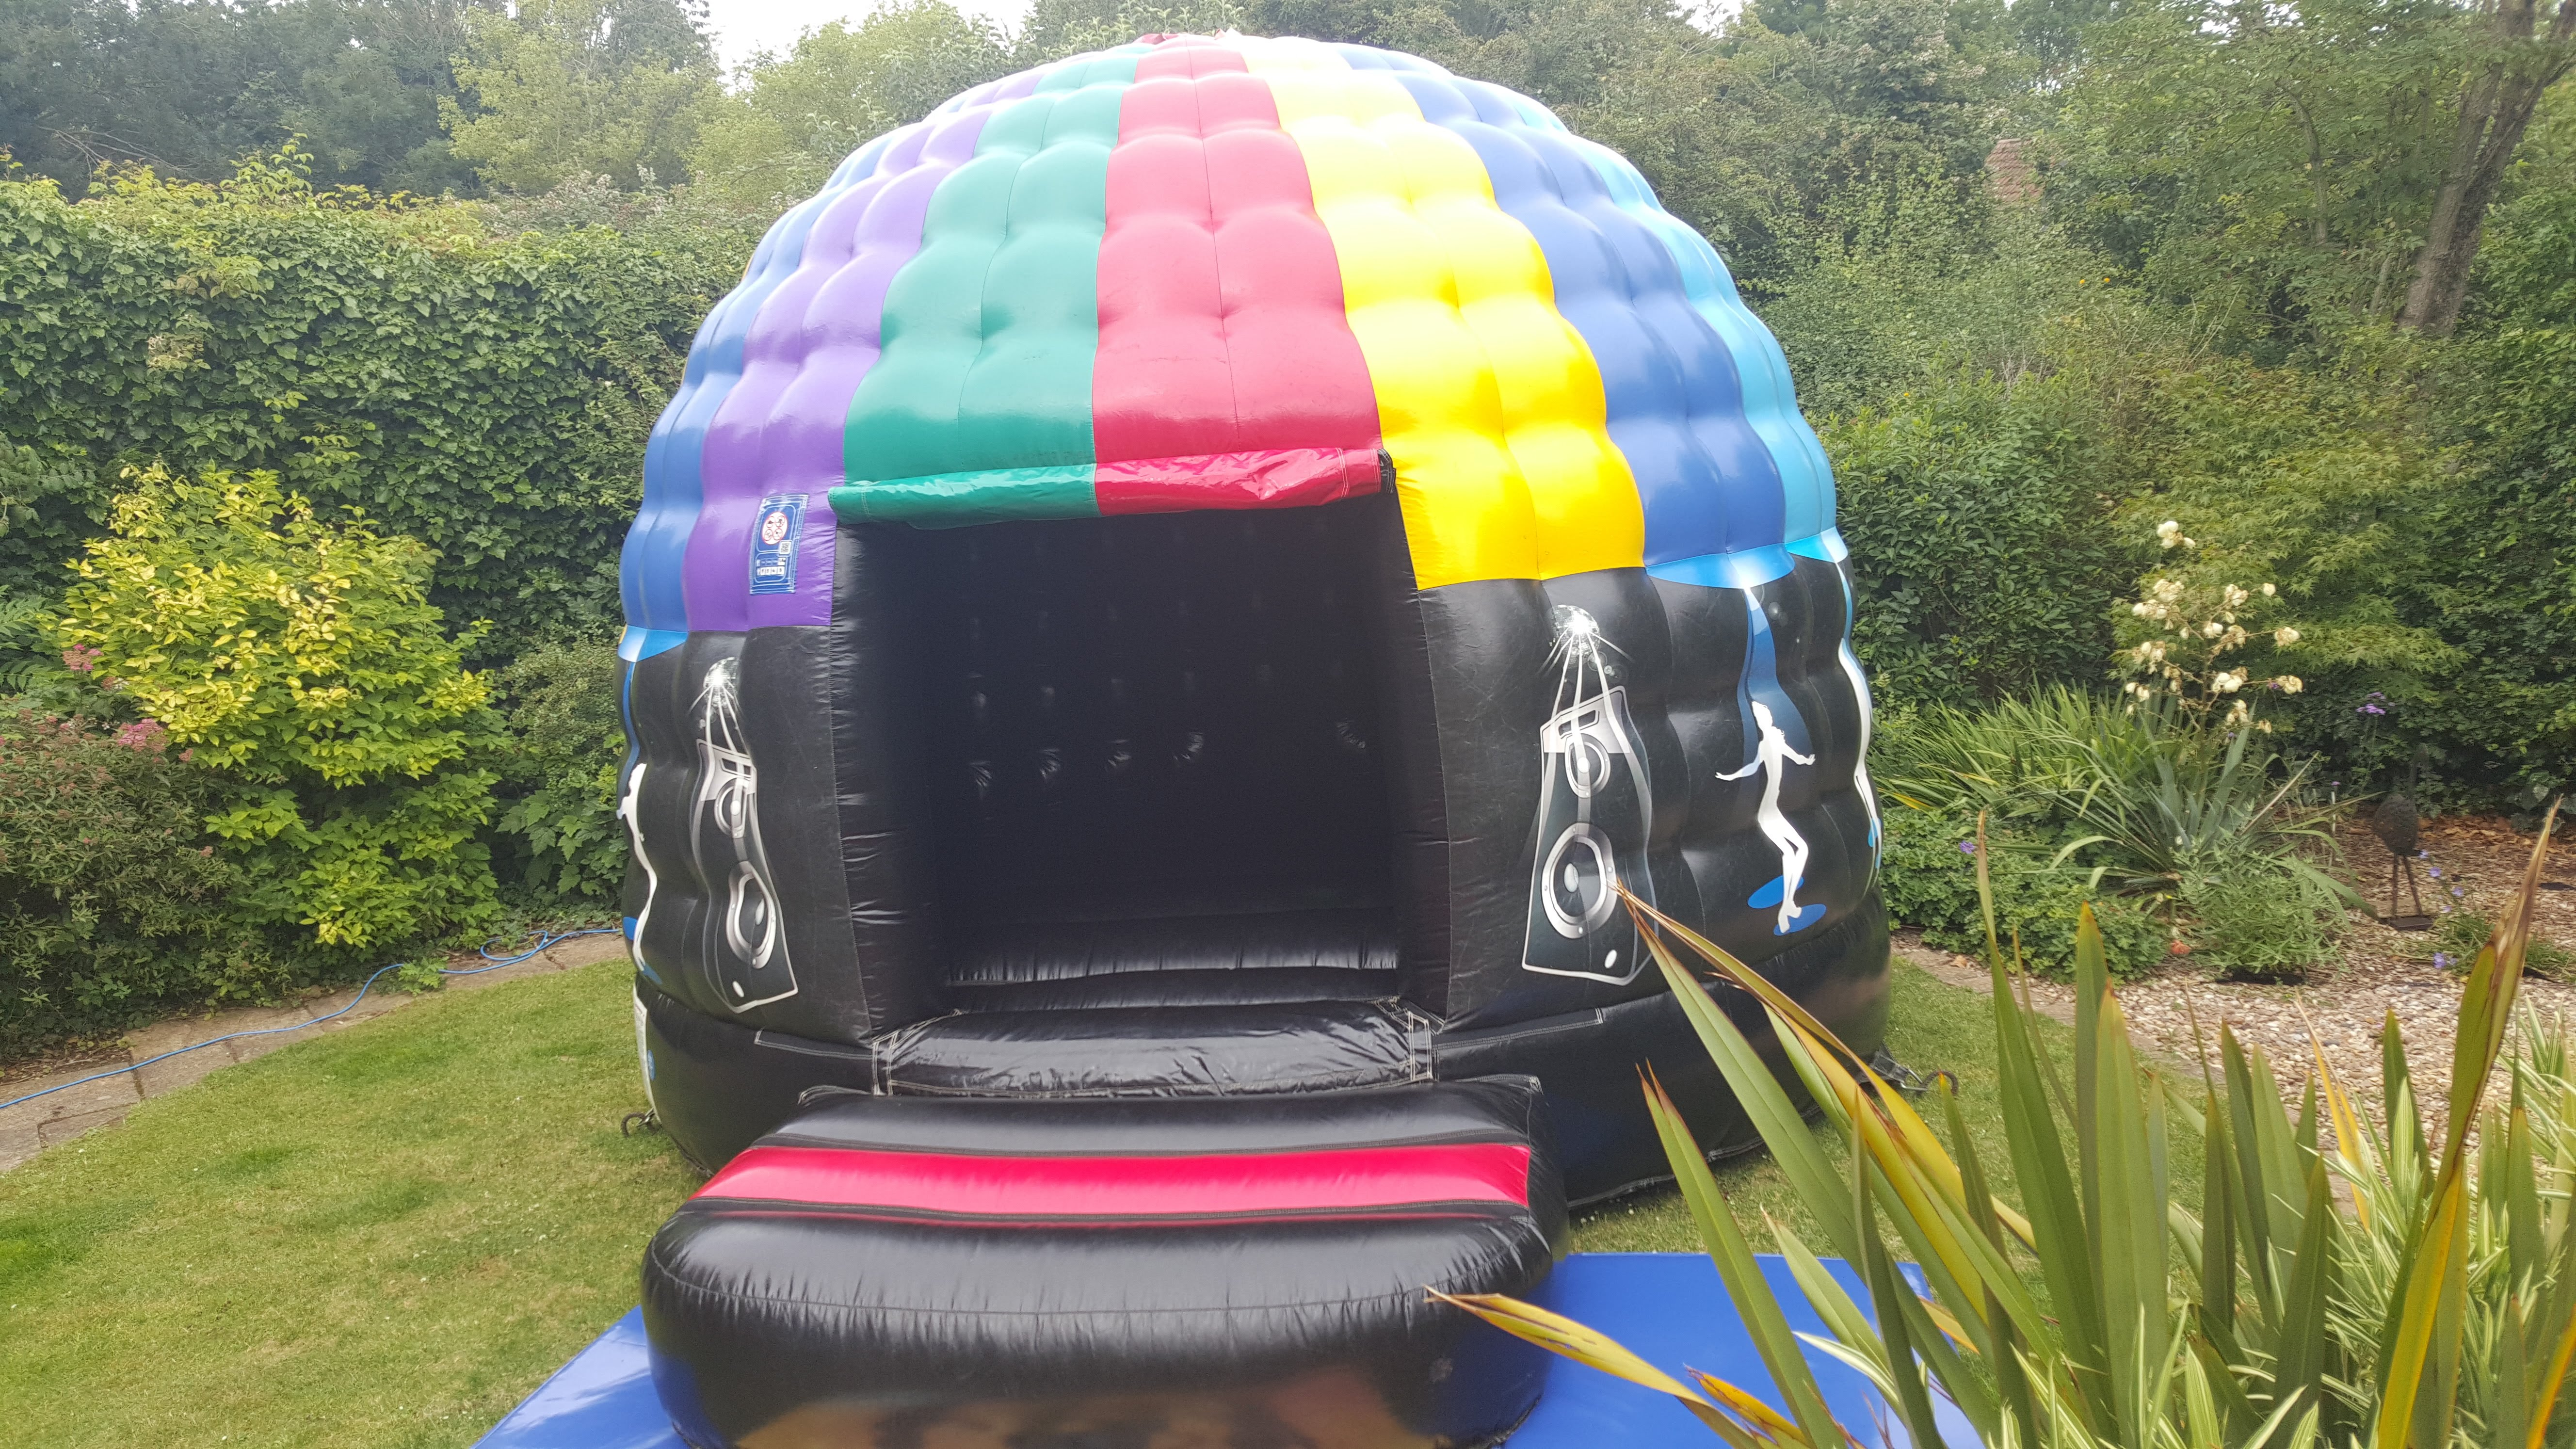 Disco Dome Bouncy Castle In Dyson Close, Peterborough